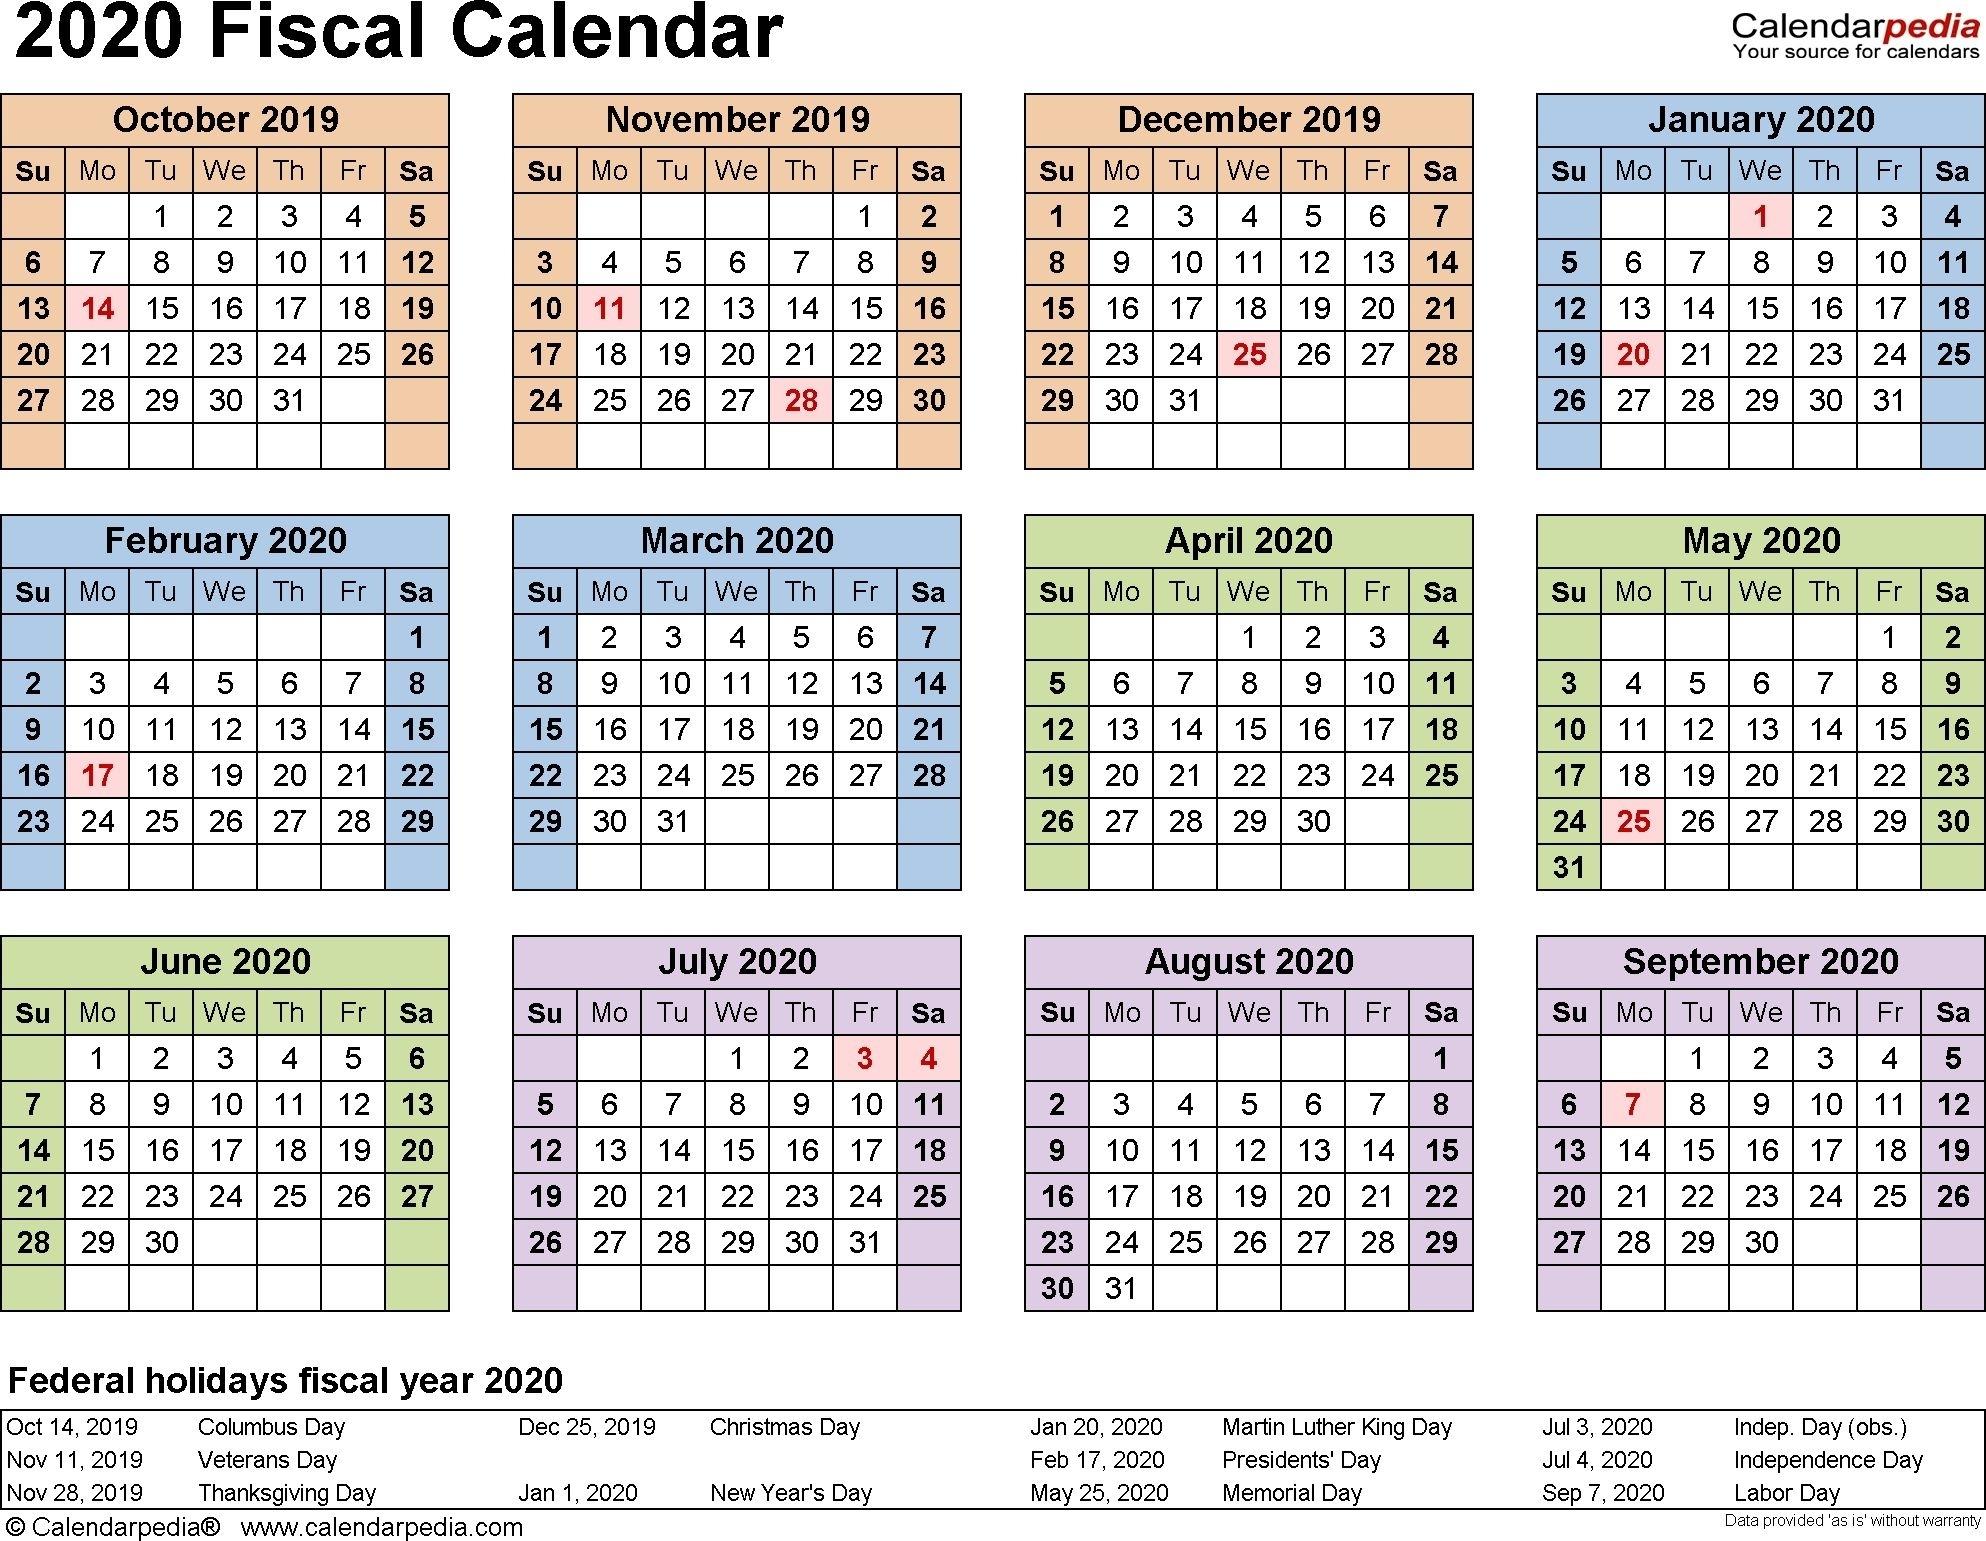 2019 2020 Financial Year Calendar In 2020   Payroll Calendar within Financial Calendar 2019-2020 In Weeks